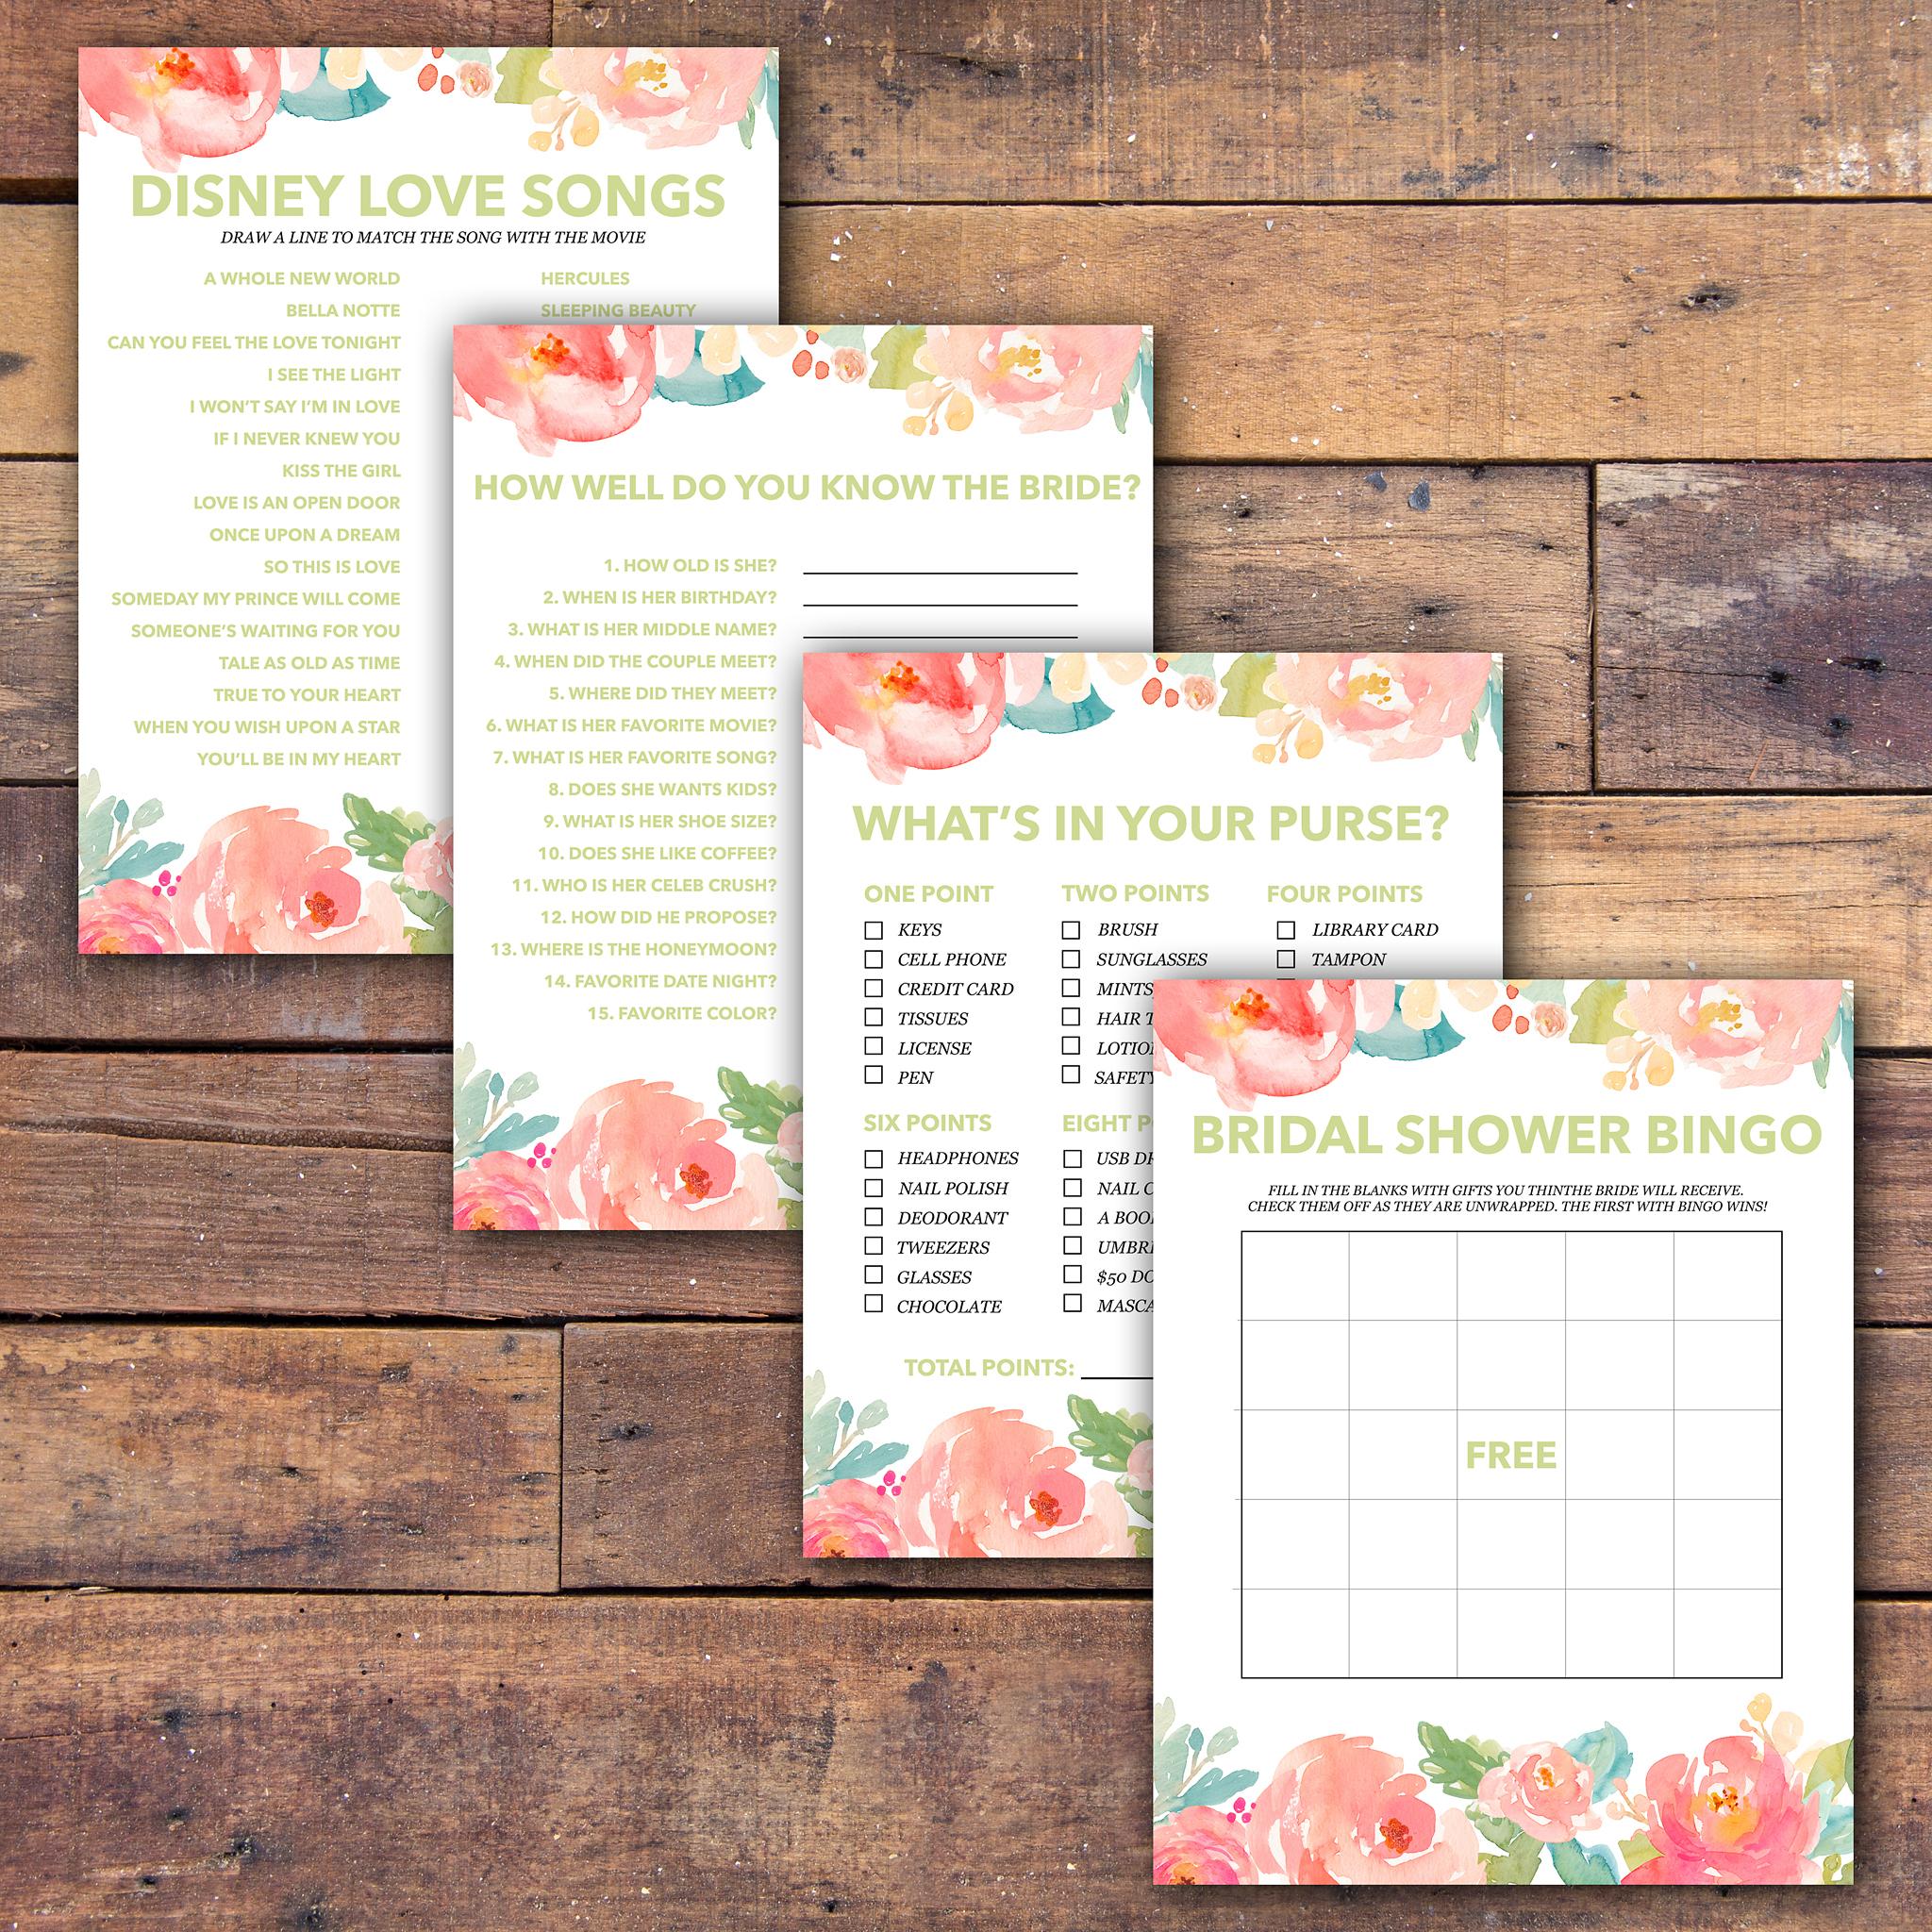 Bridal Shower Games Free Printable - - Samantha Jean Photograhy - Free Printable Bridal Shower Games